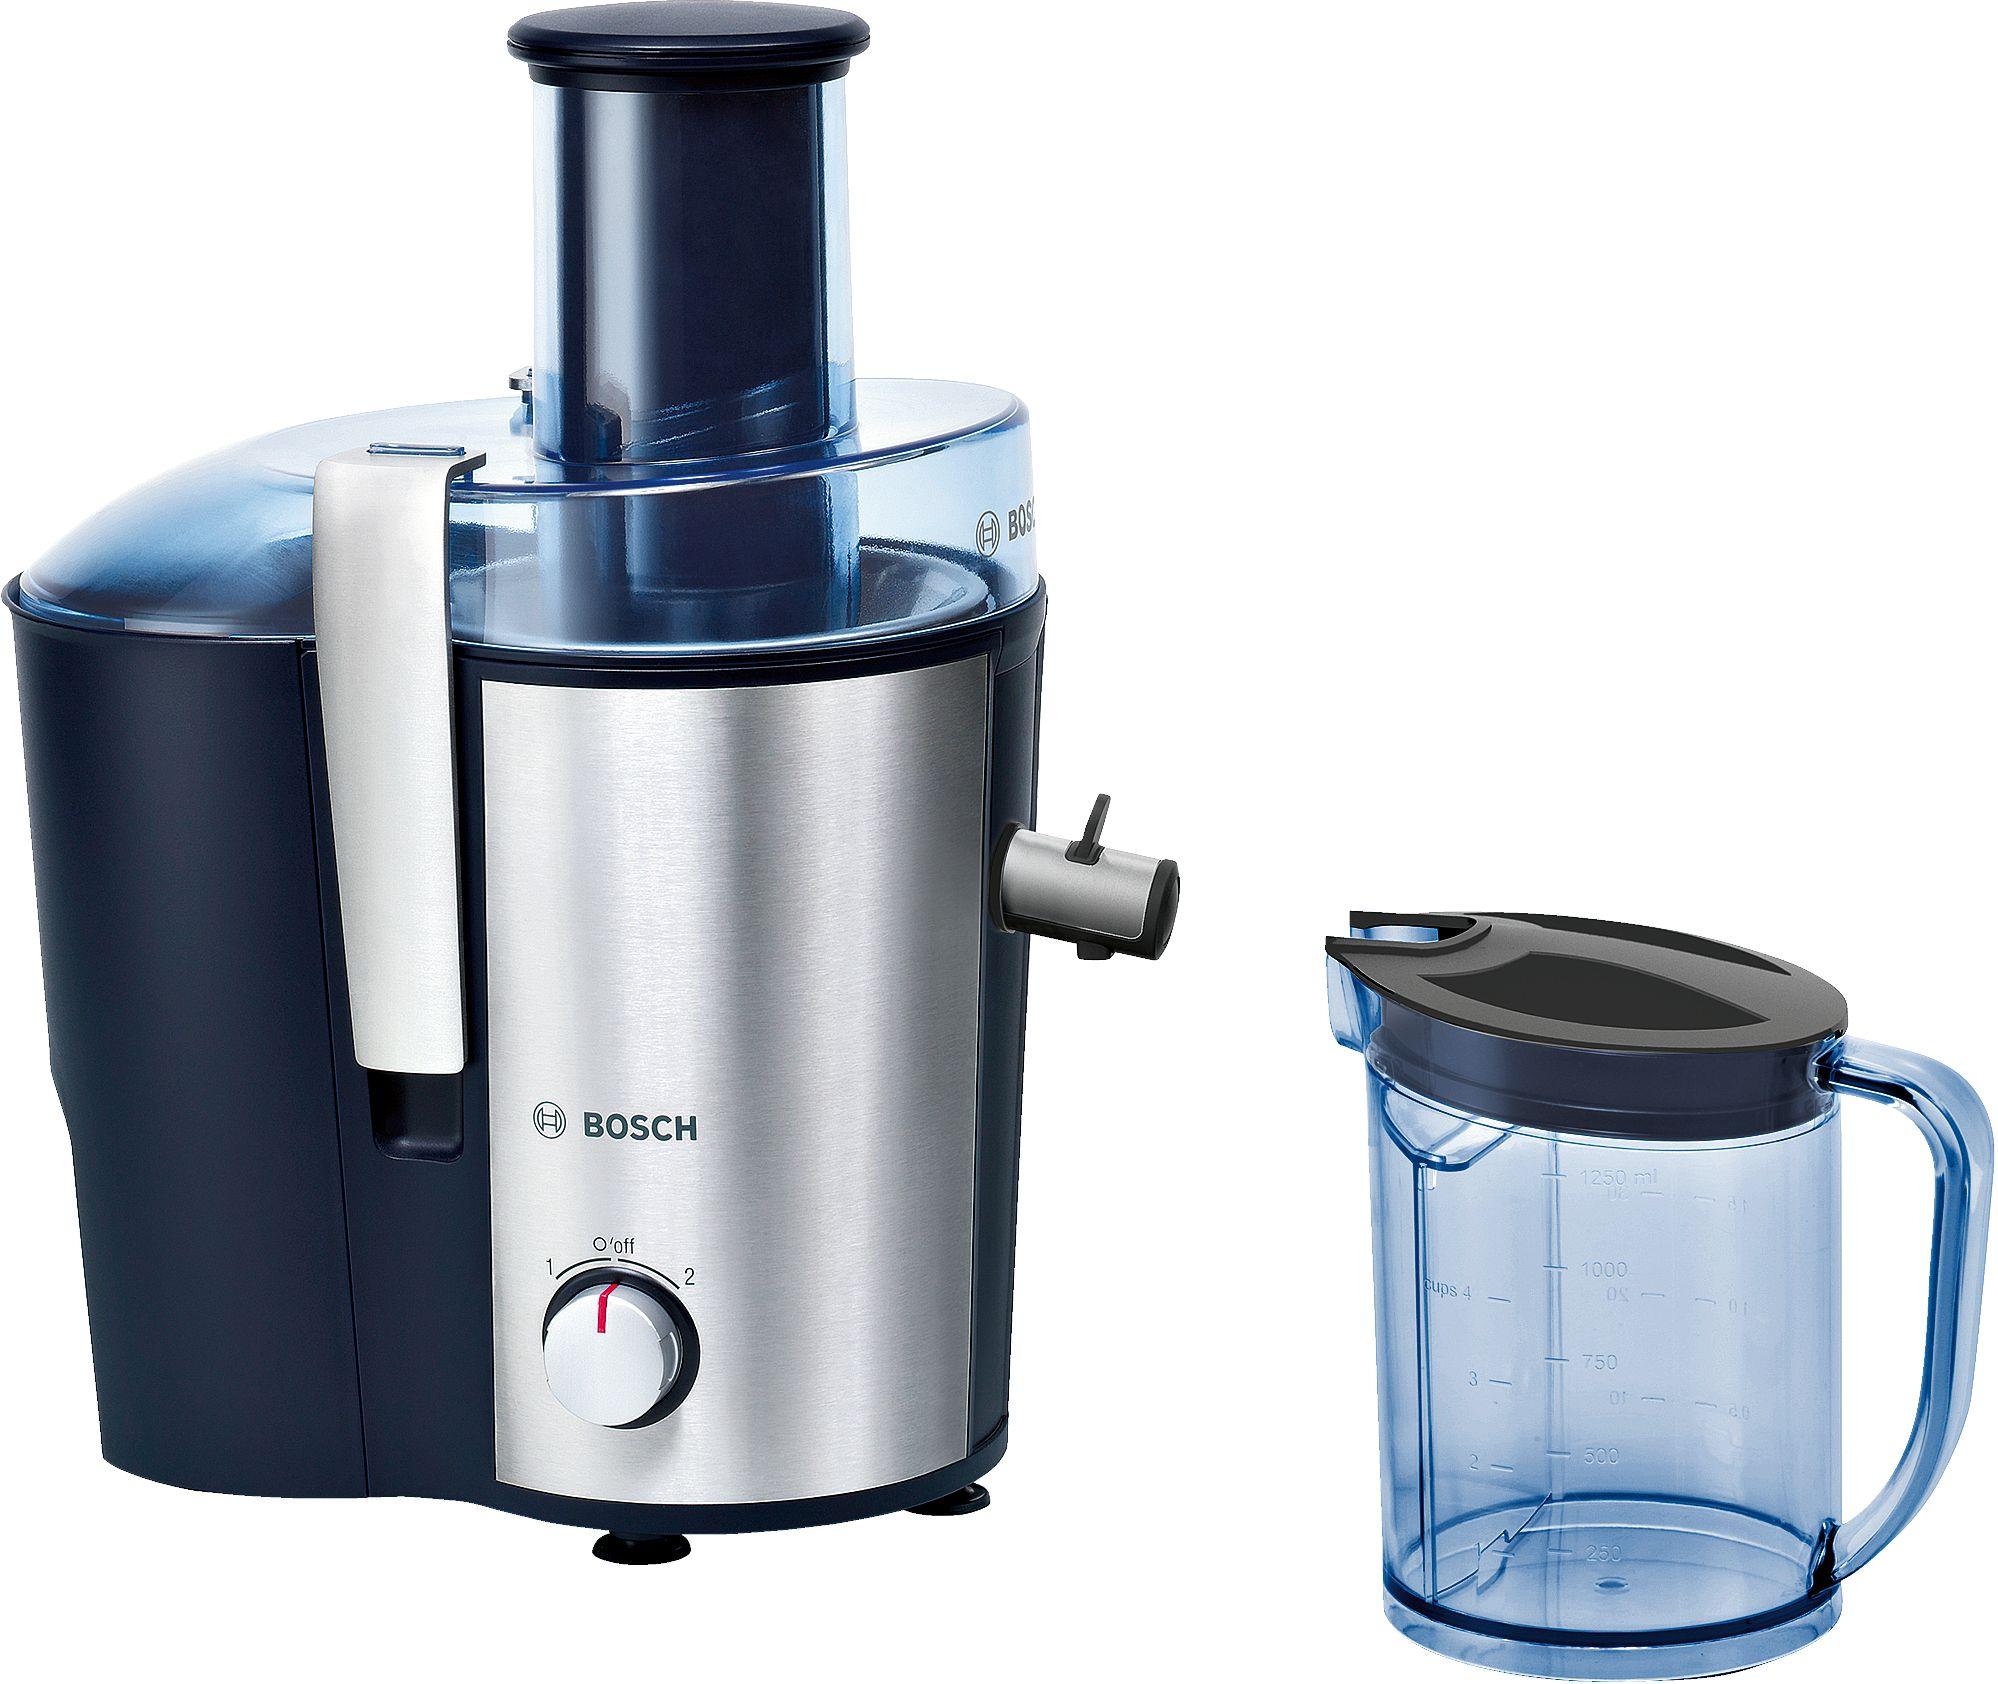 bosch mes3500 extracteur de jus vitajuice 3 700w bleu